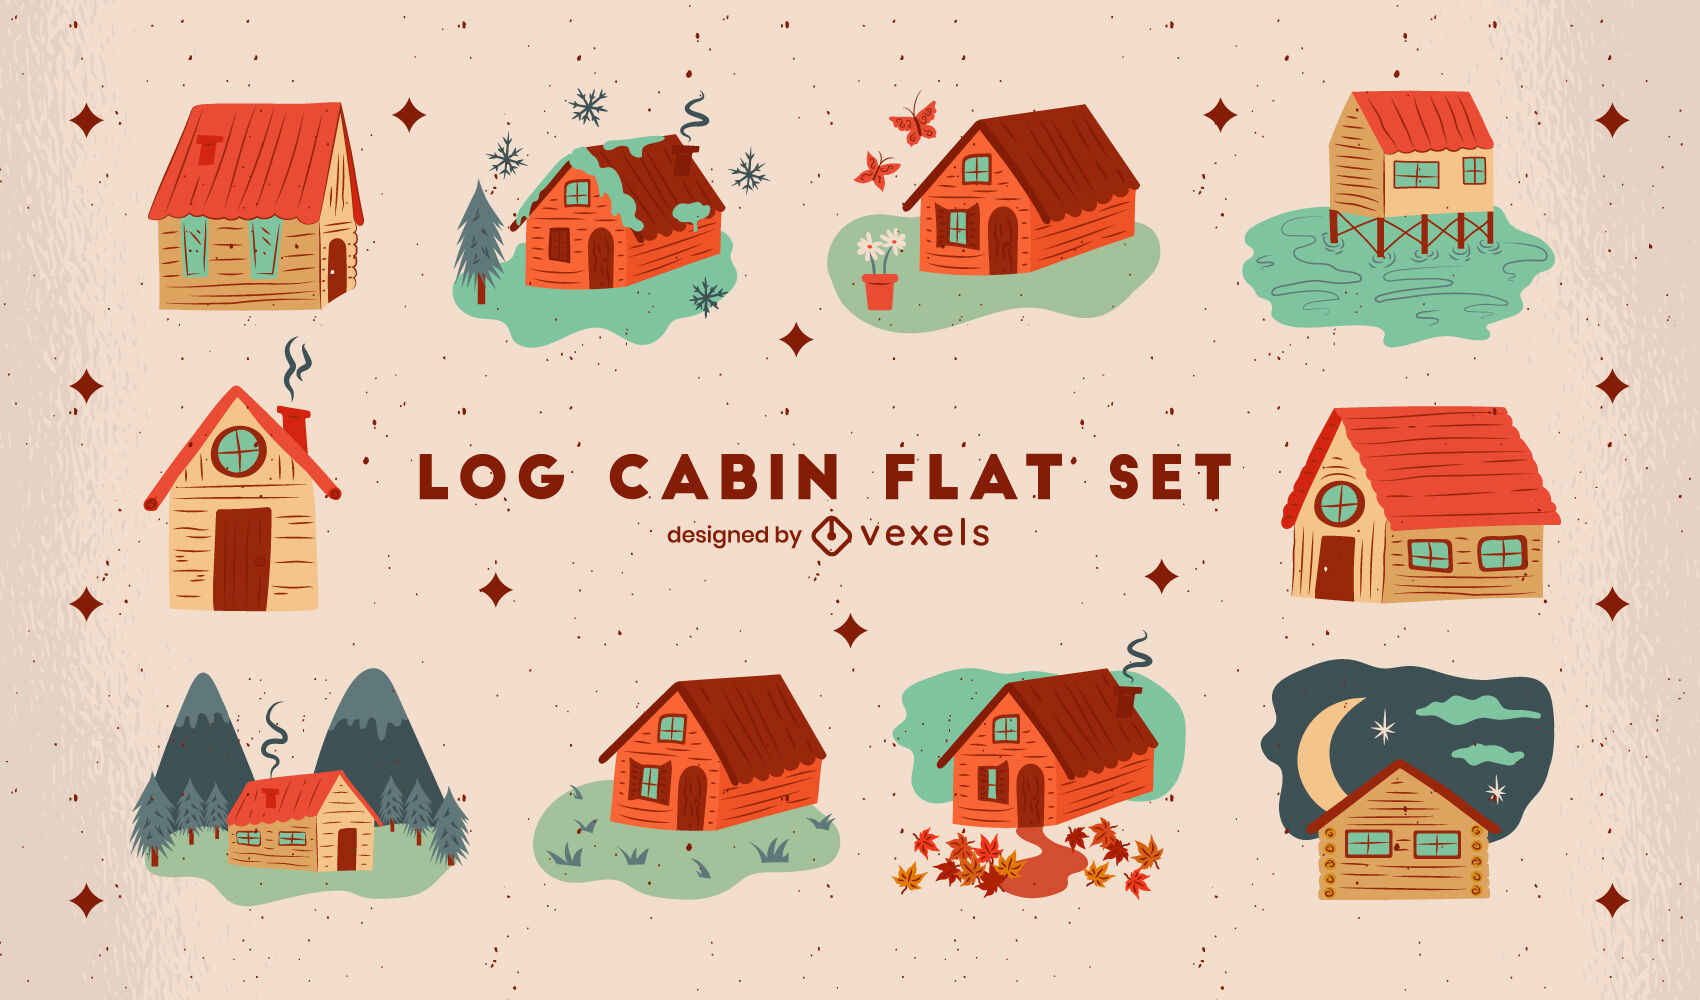 Cabaña de madera casas camping conjunto plano.